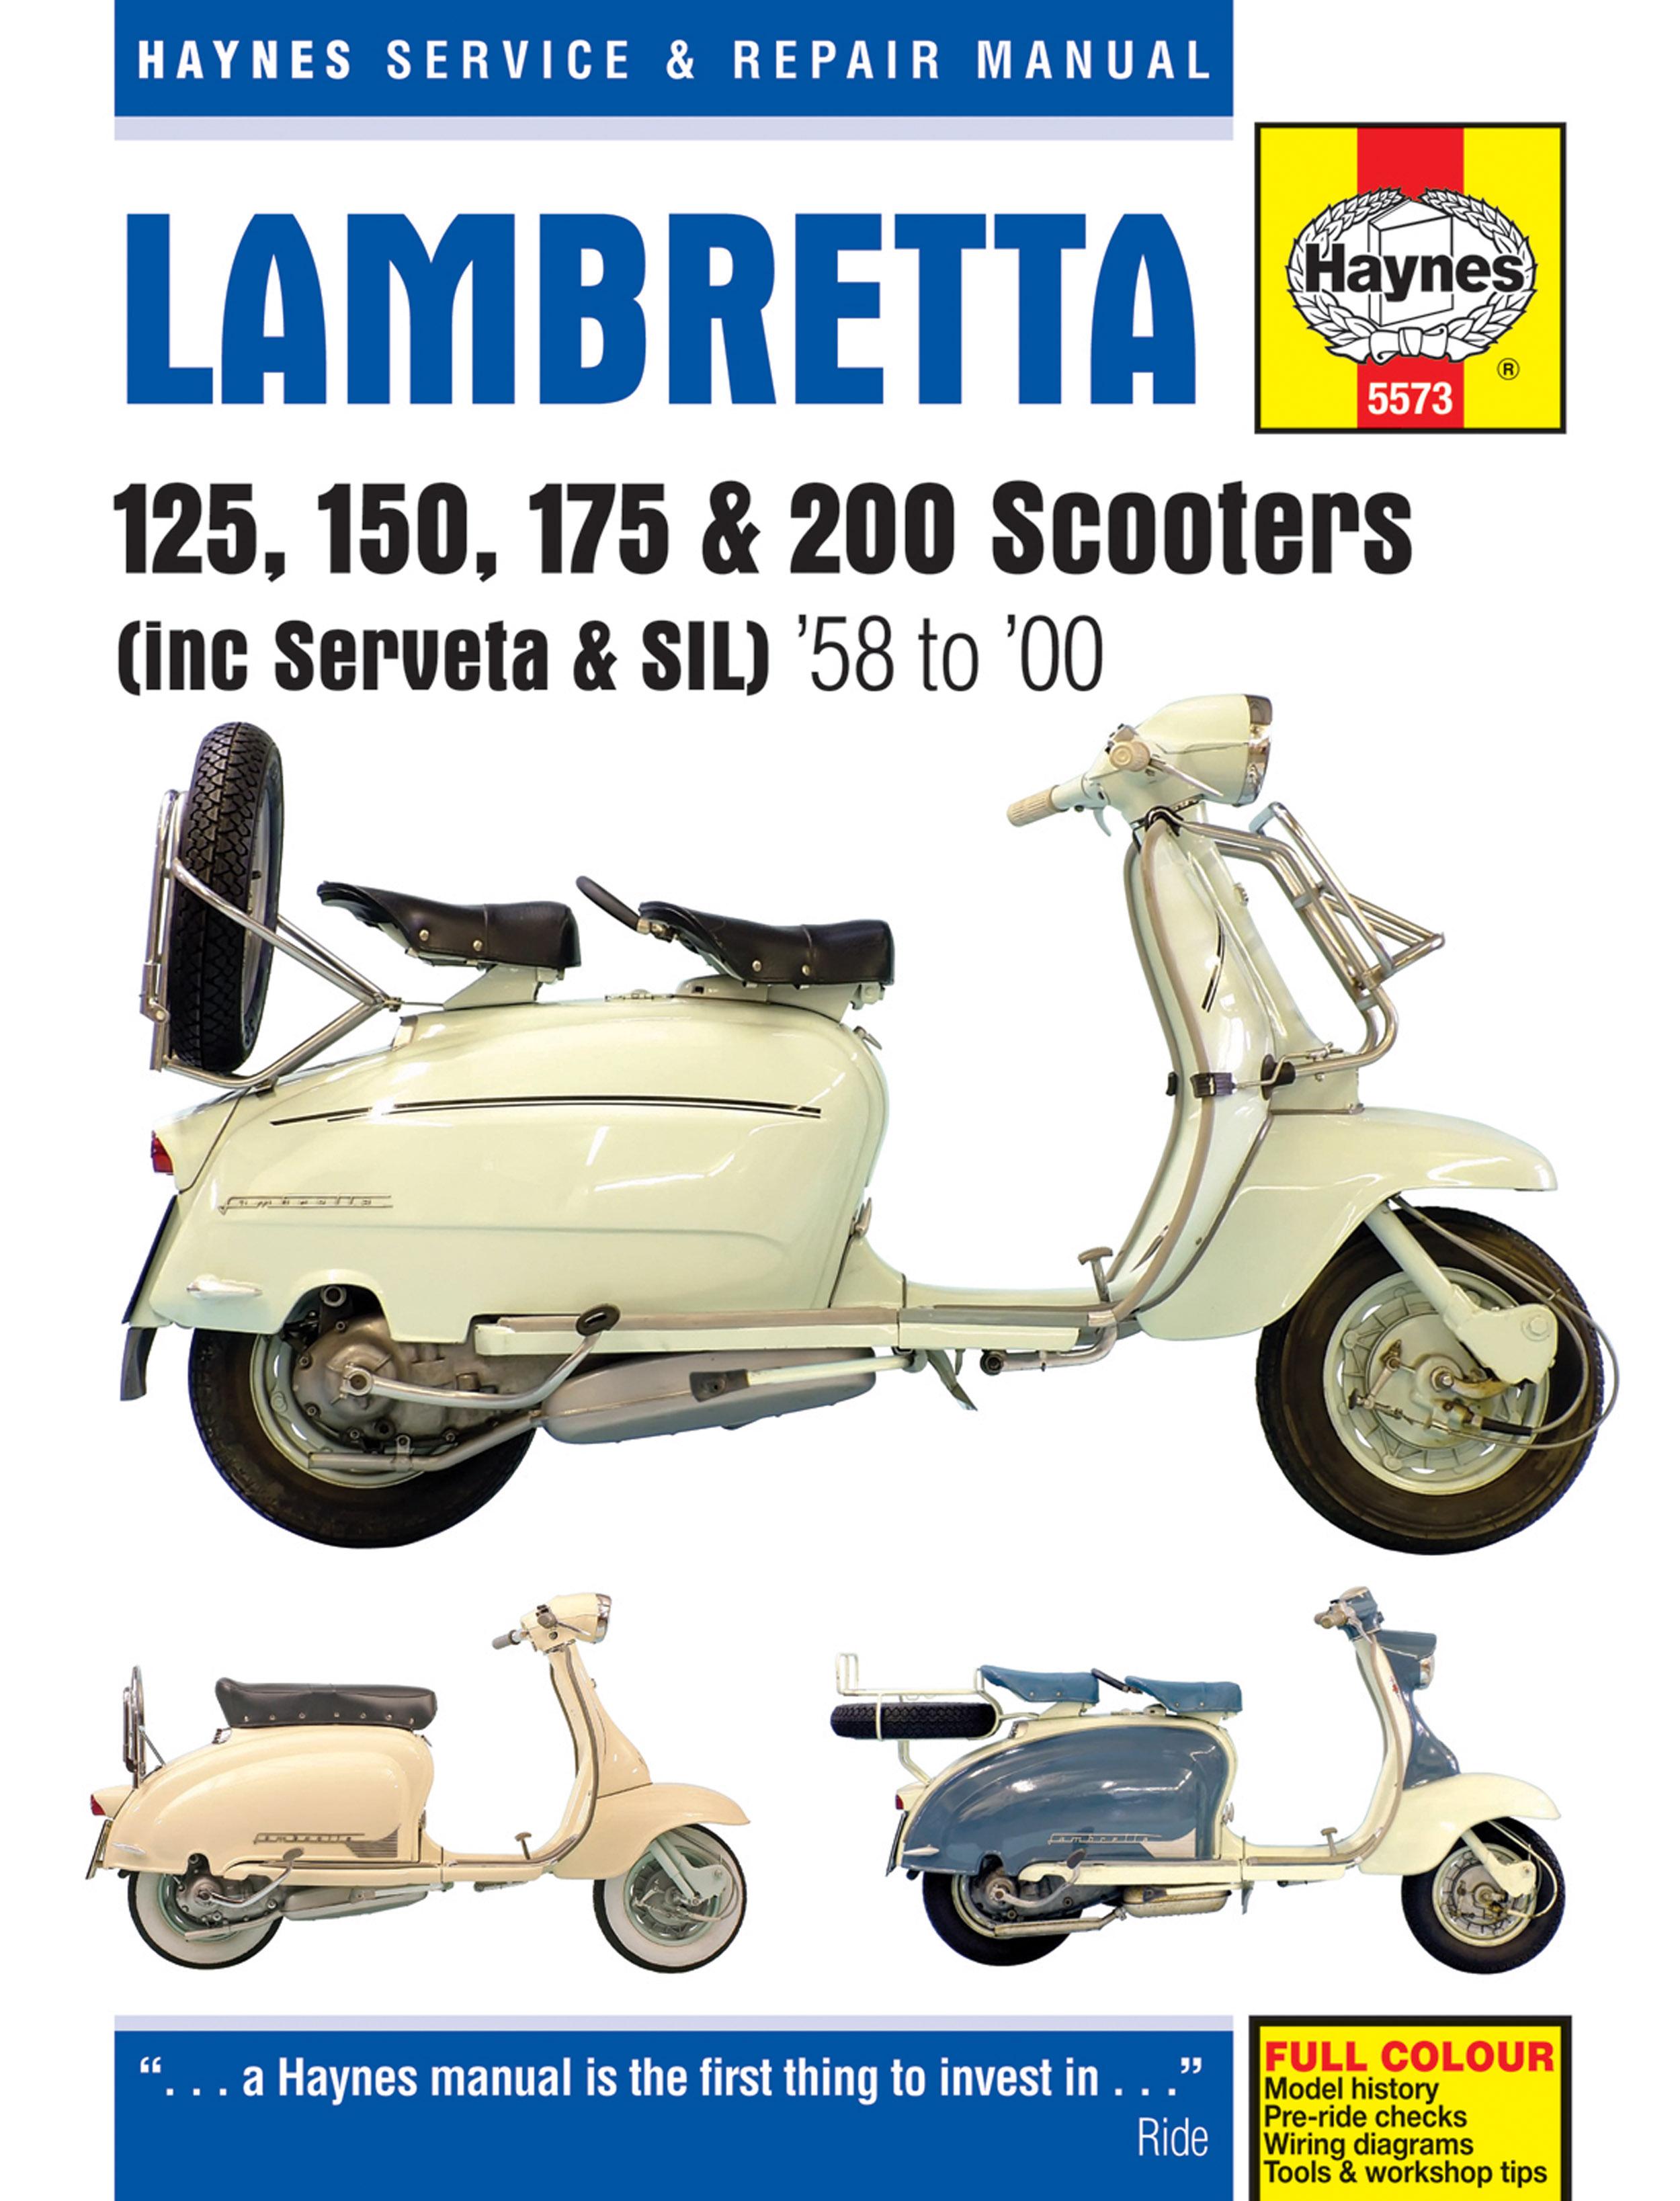 Lambretta 125, 150, 175 & 200 Scooters (58-00) Haynes Repair Manual (includes Serveta & SIL)